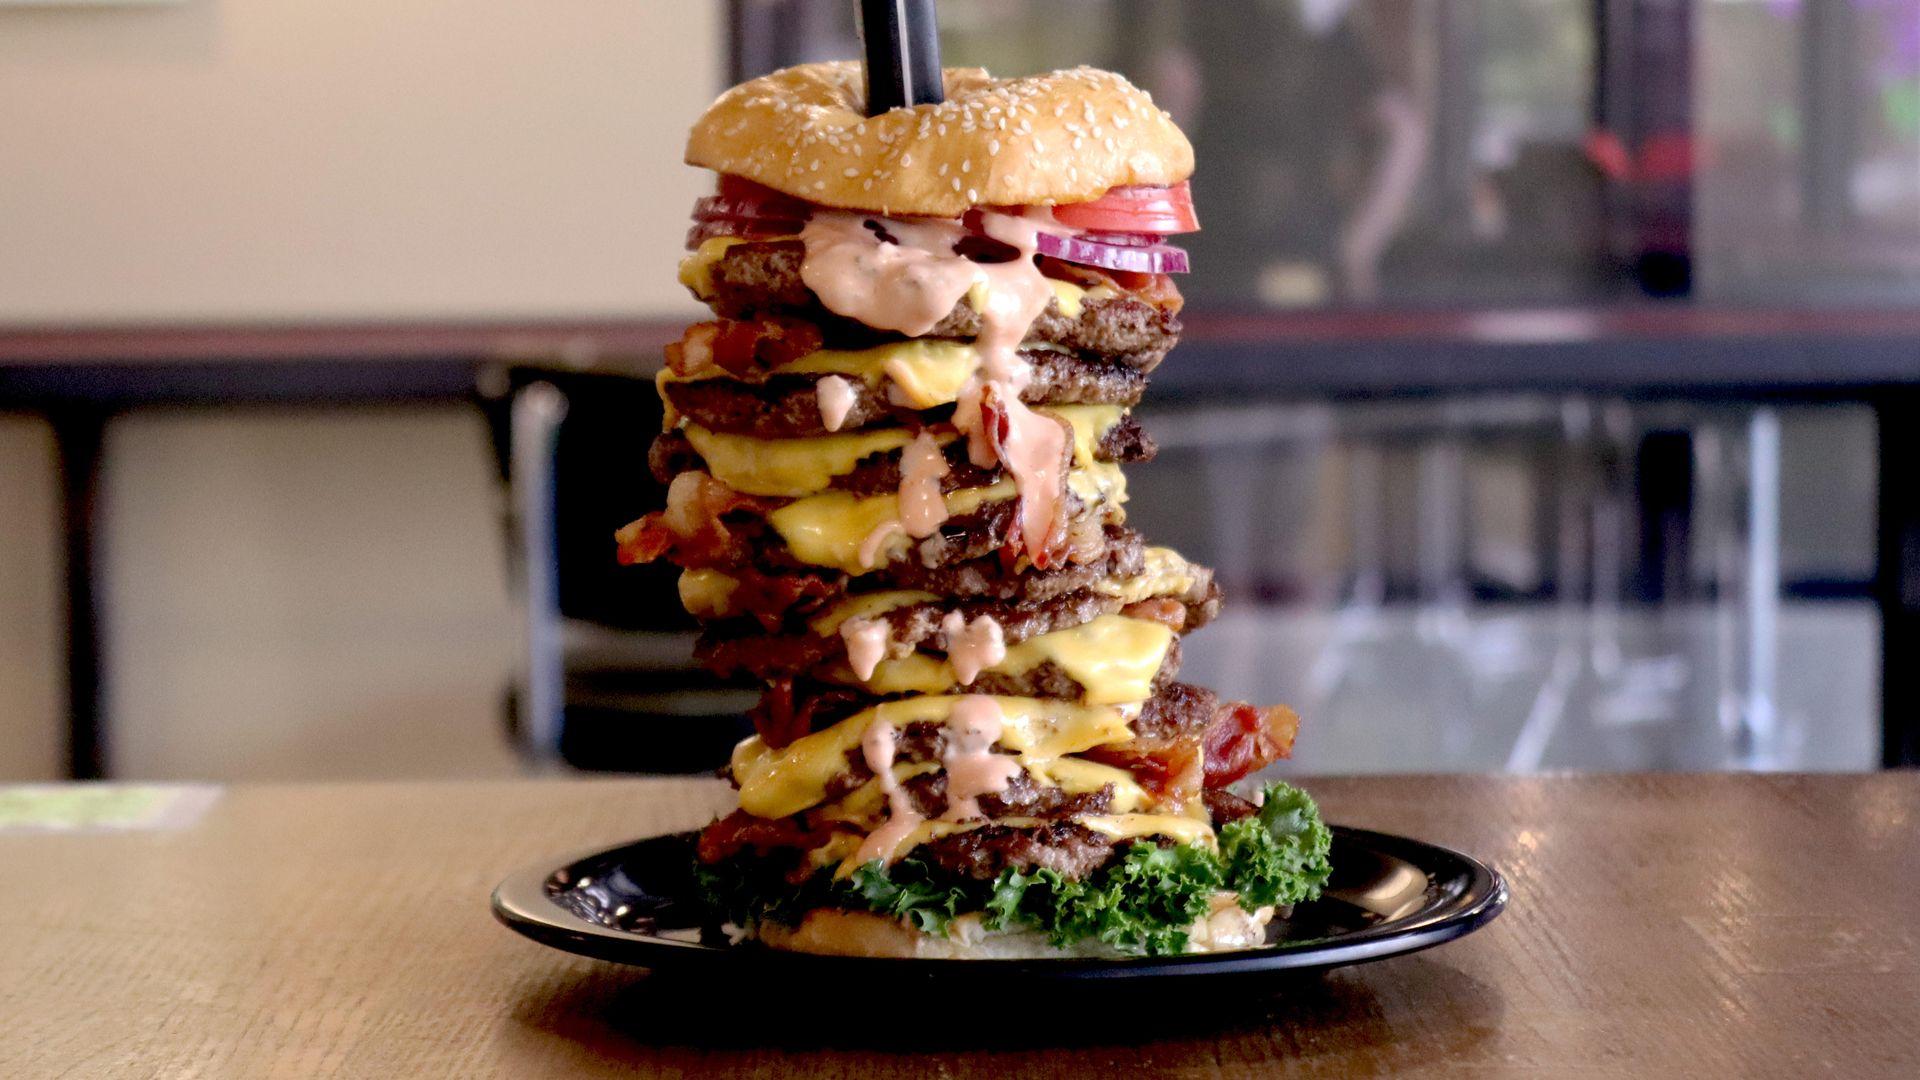 A photo of a burger.